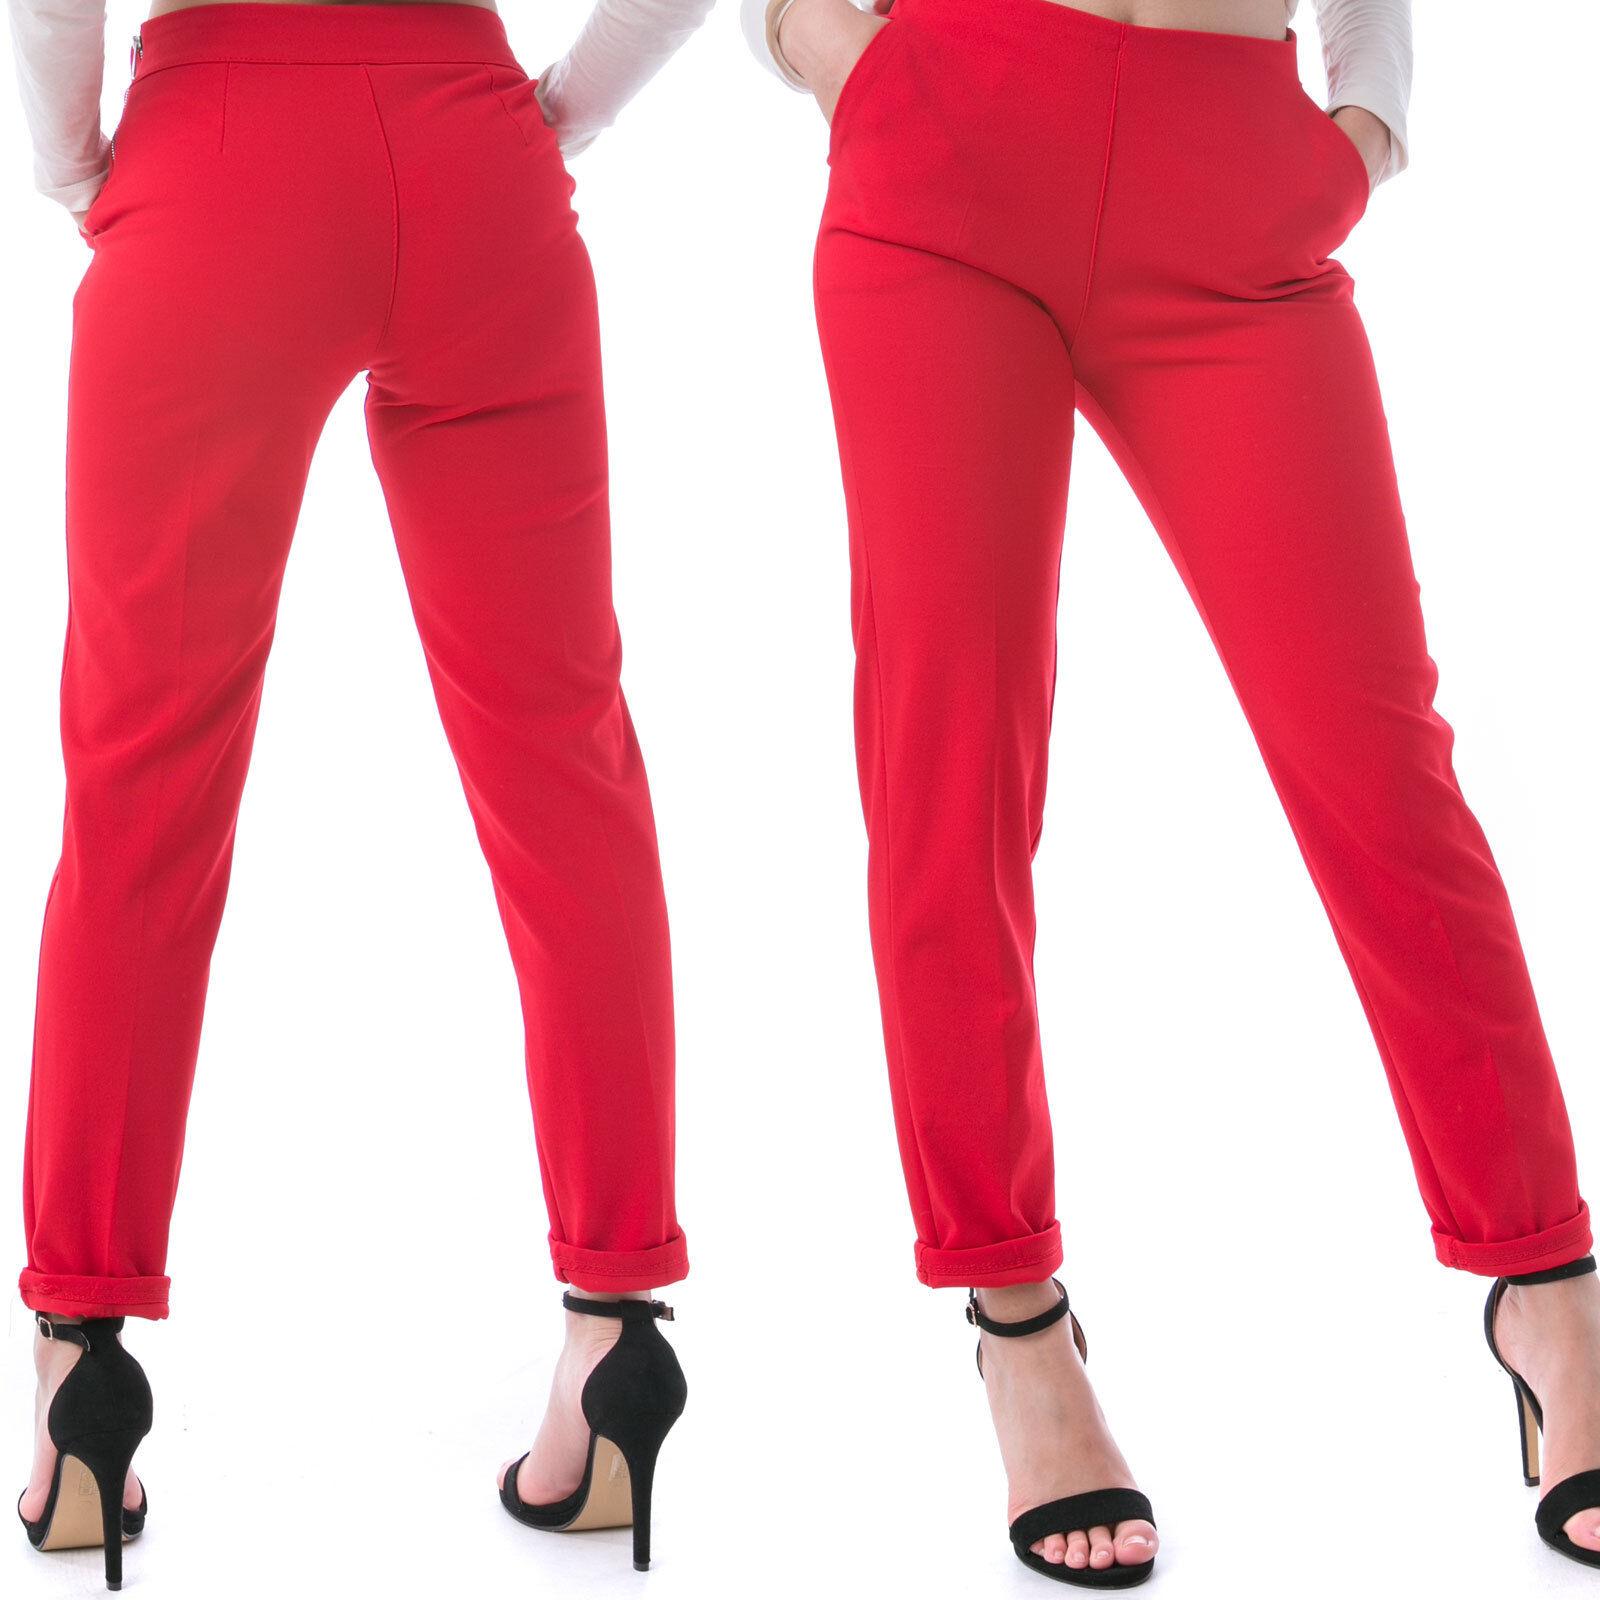 MFORSHOP pantalone pantaloni donna vita alta elegante cerniera  aderente 8520